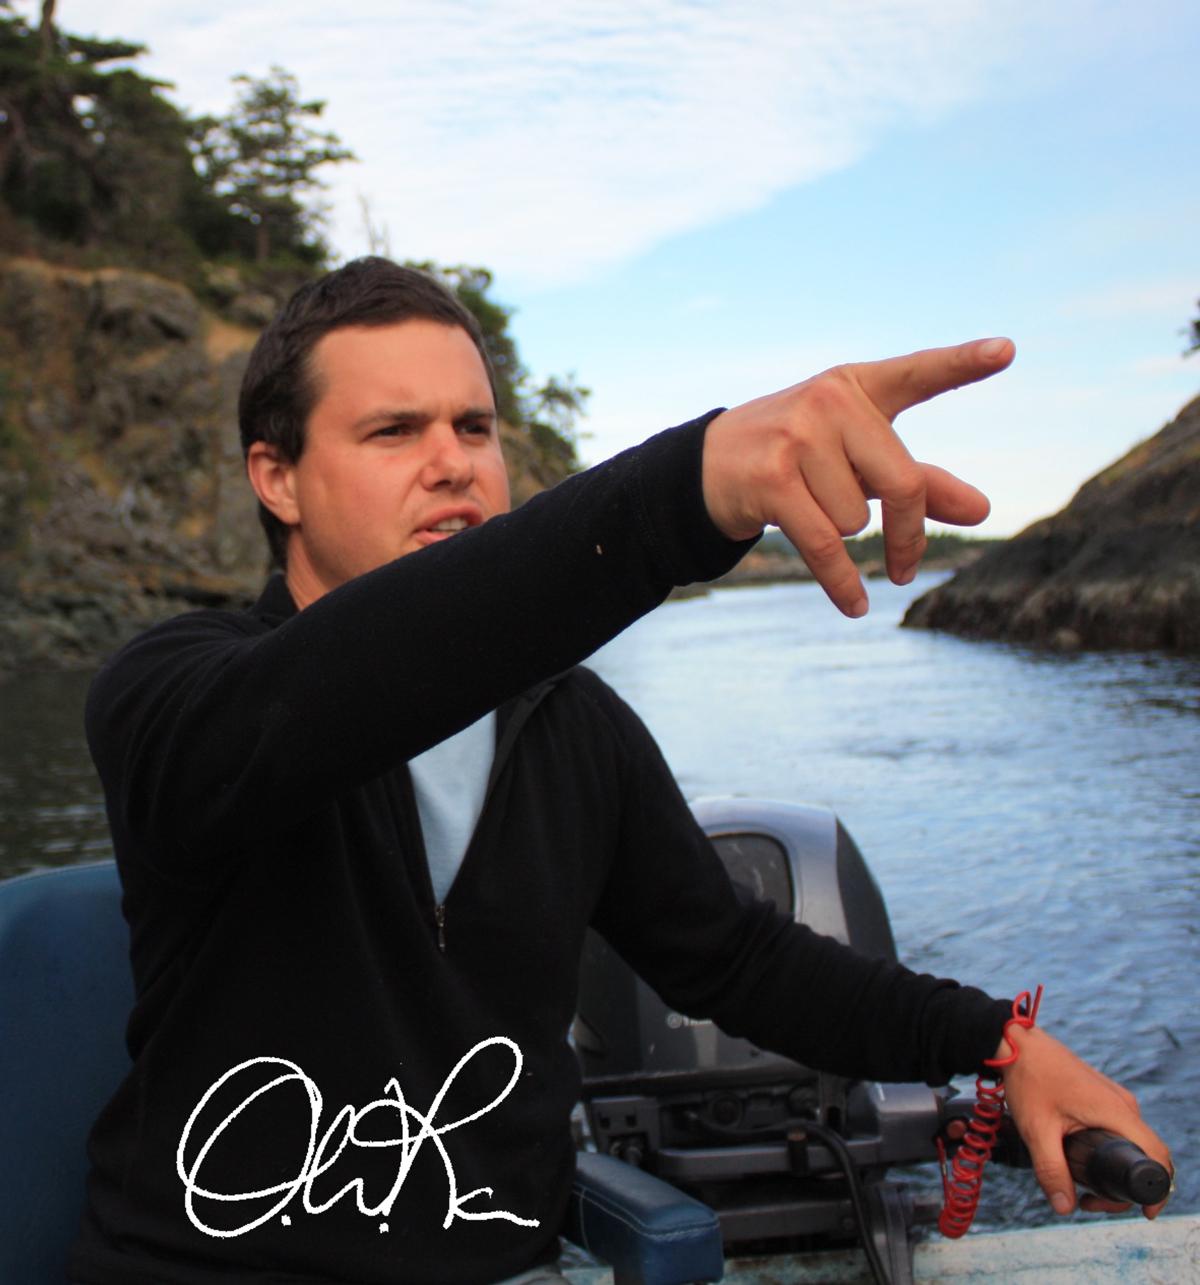 David-Boat-4-sig.jpg